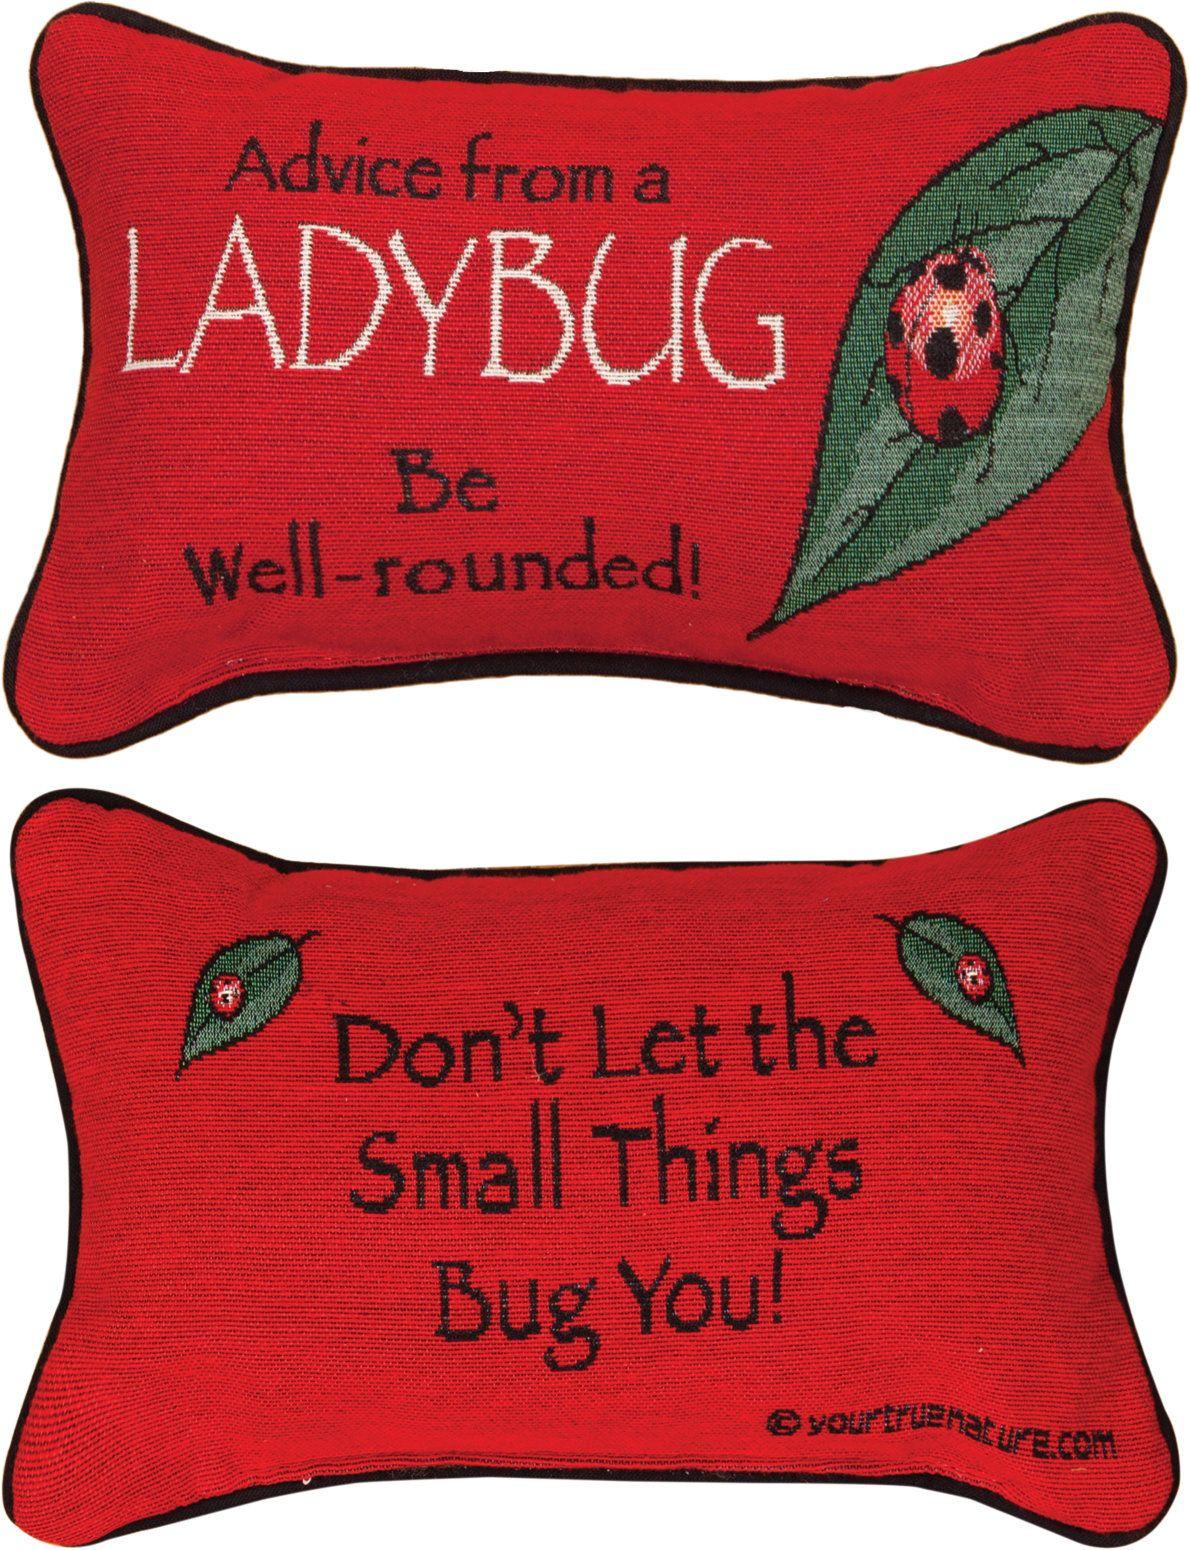 Advice From A Lady Bug Word Lumbar Pillow Ladybug Pillow Word Pillow Ladybug